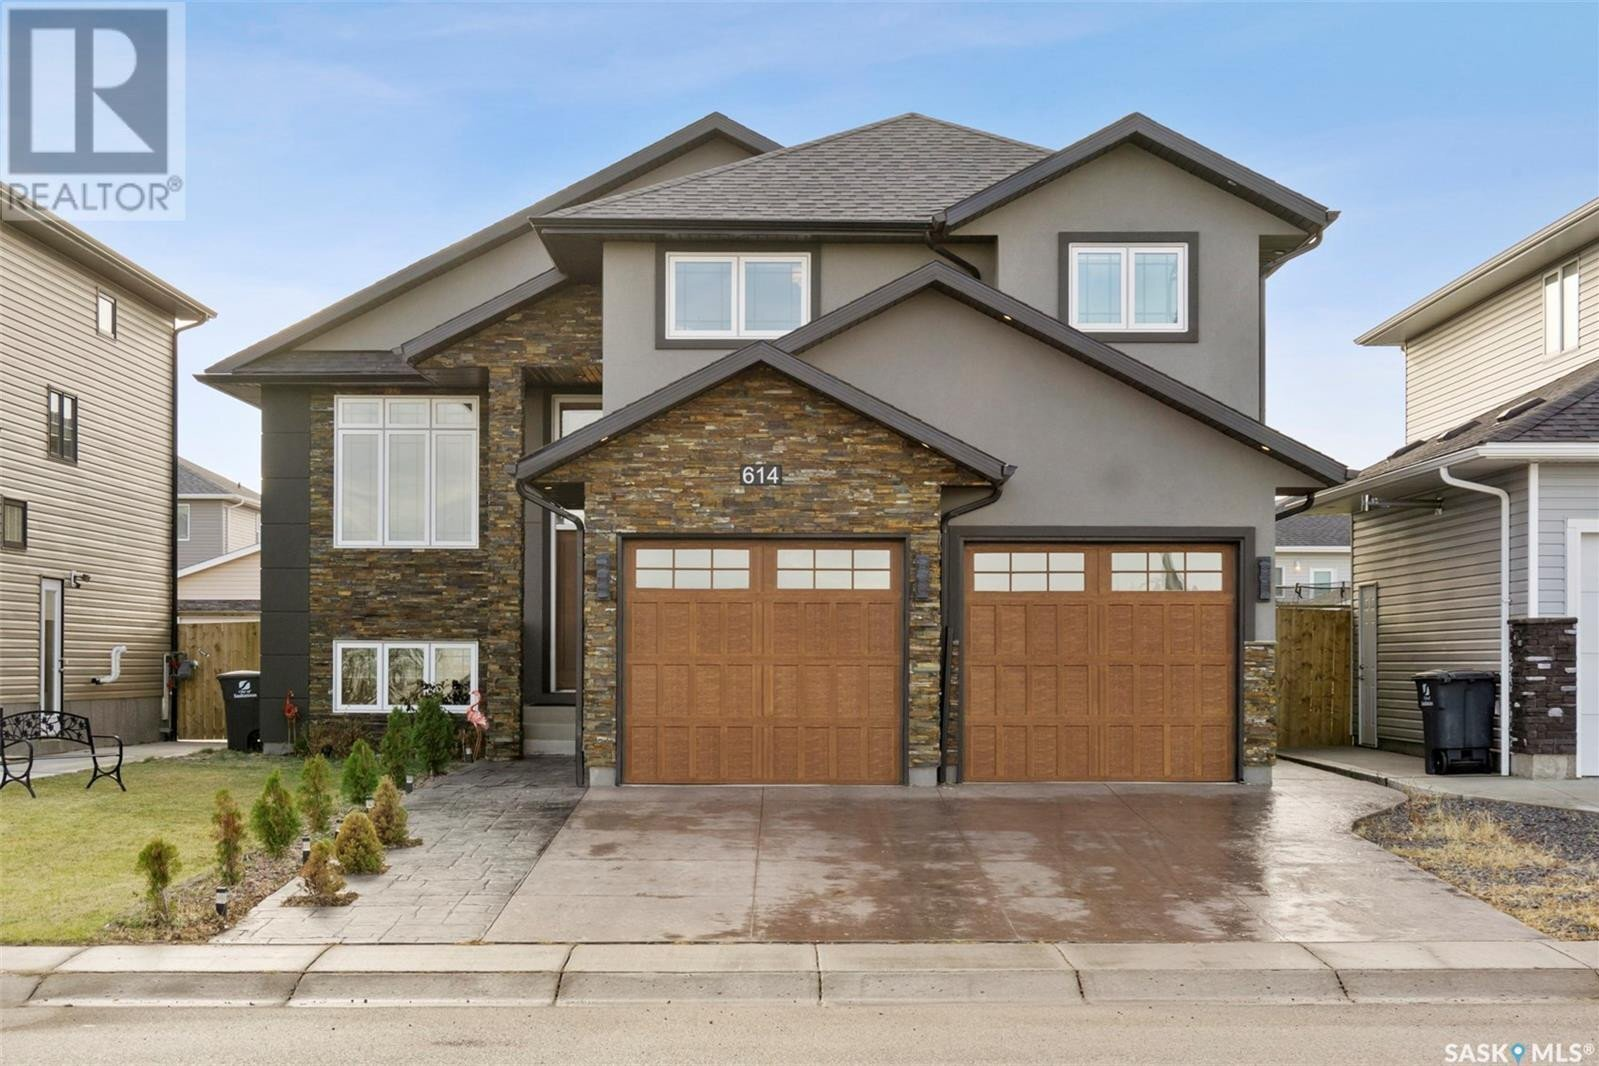 House for sale at 614 Boykowich Cres Saskatoon Saskatchewan - MLS: SK833387